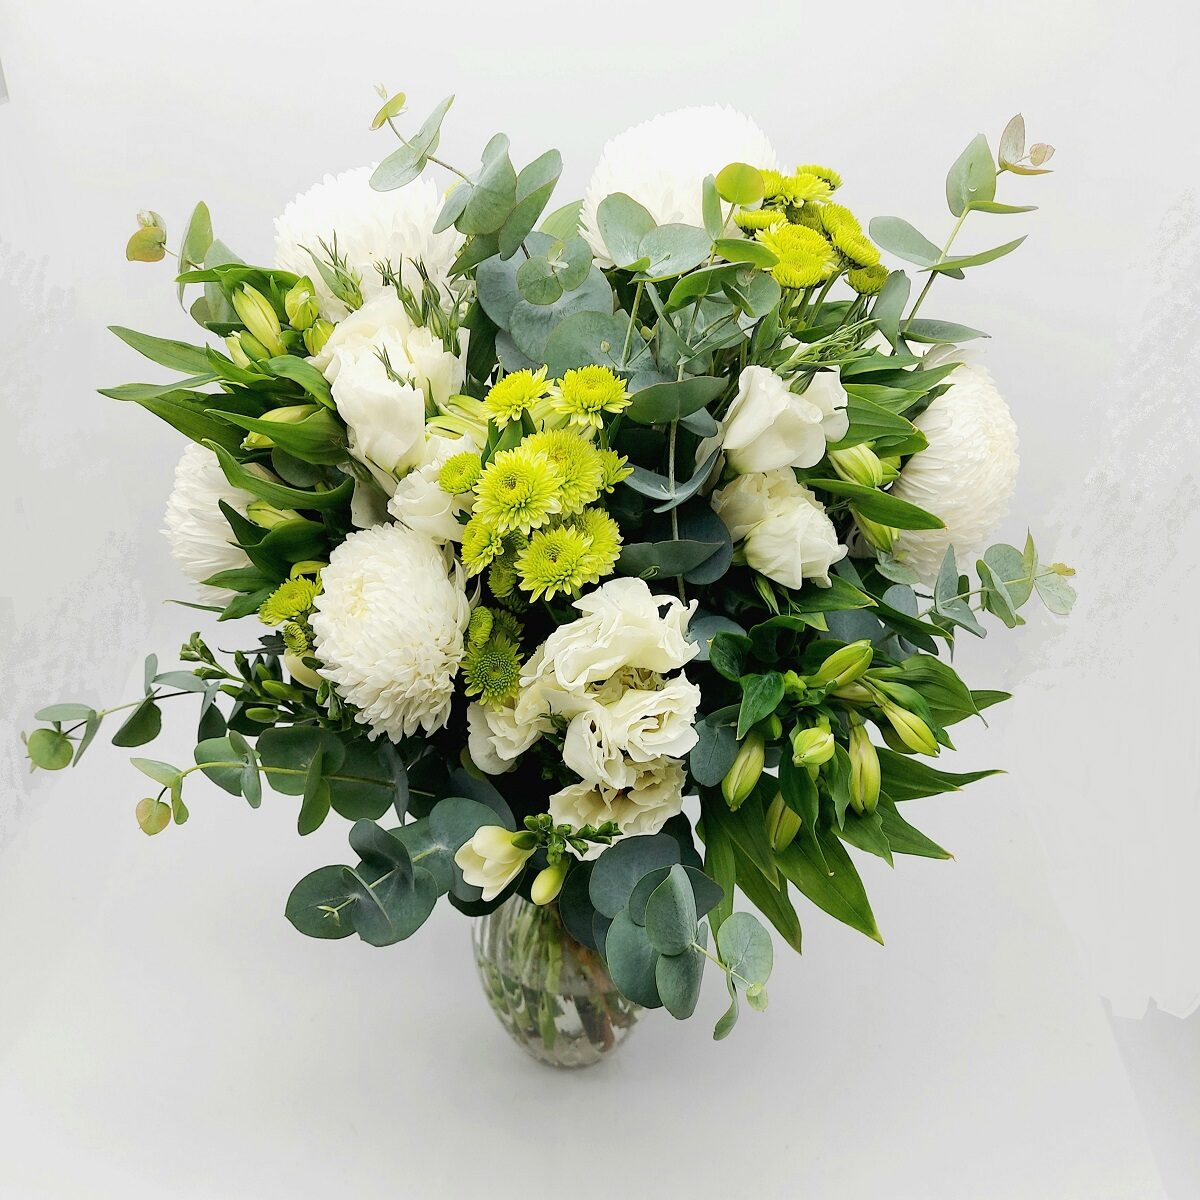 white and green vase